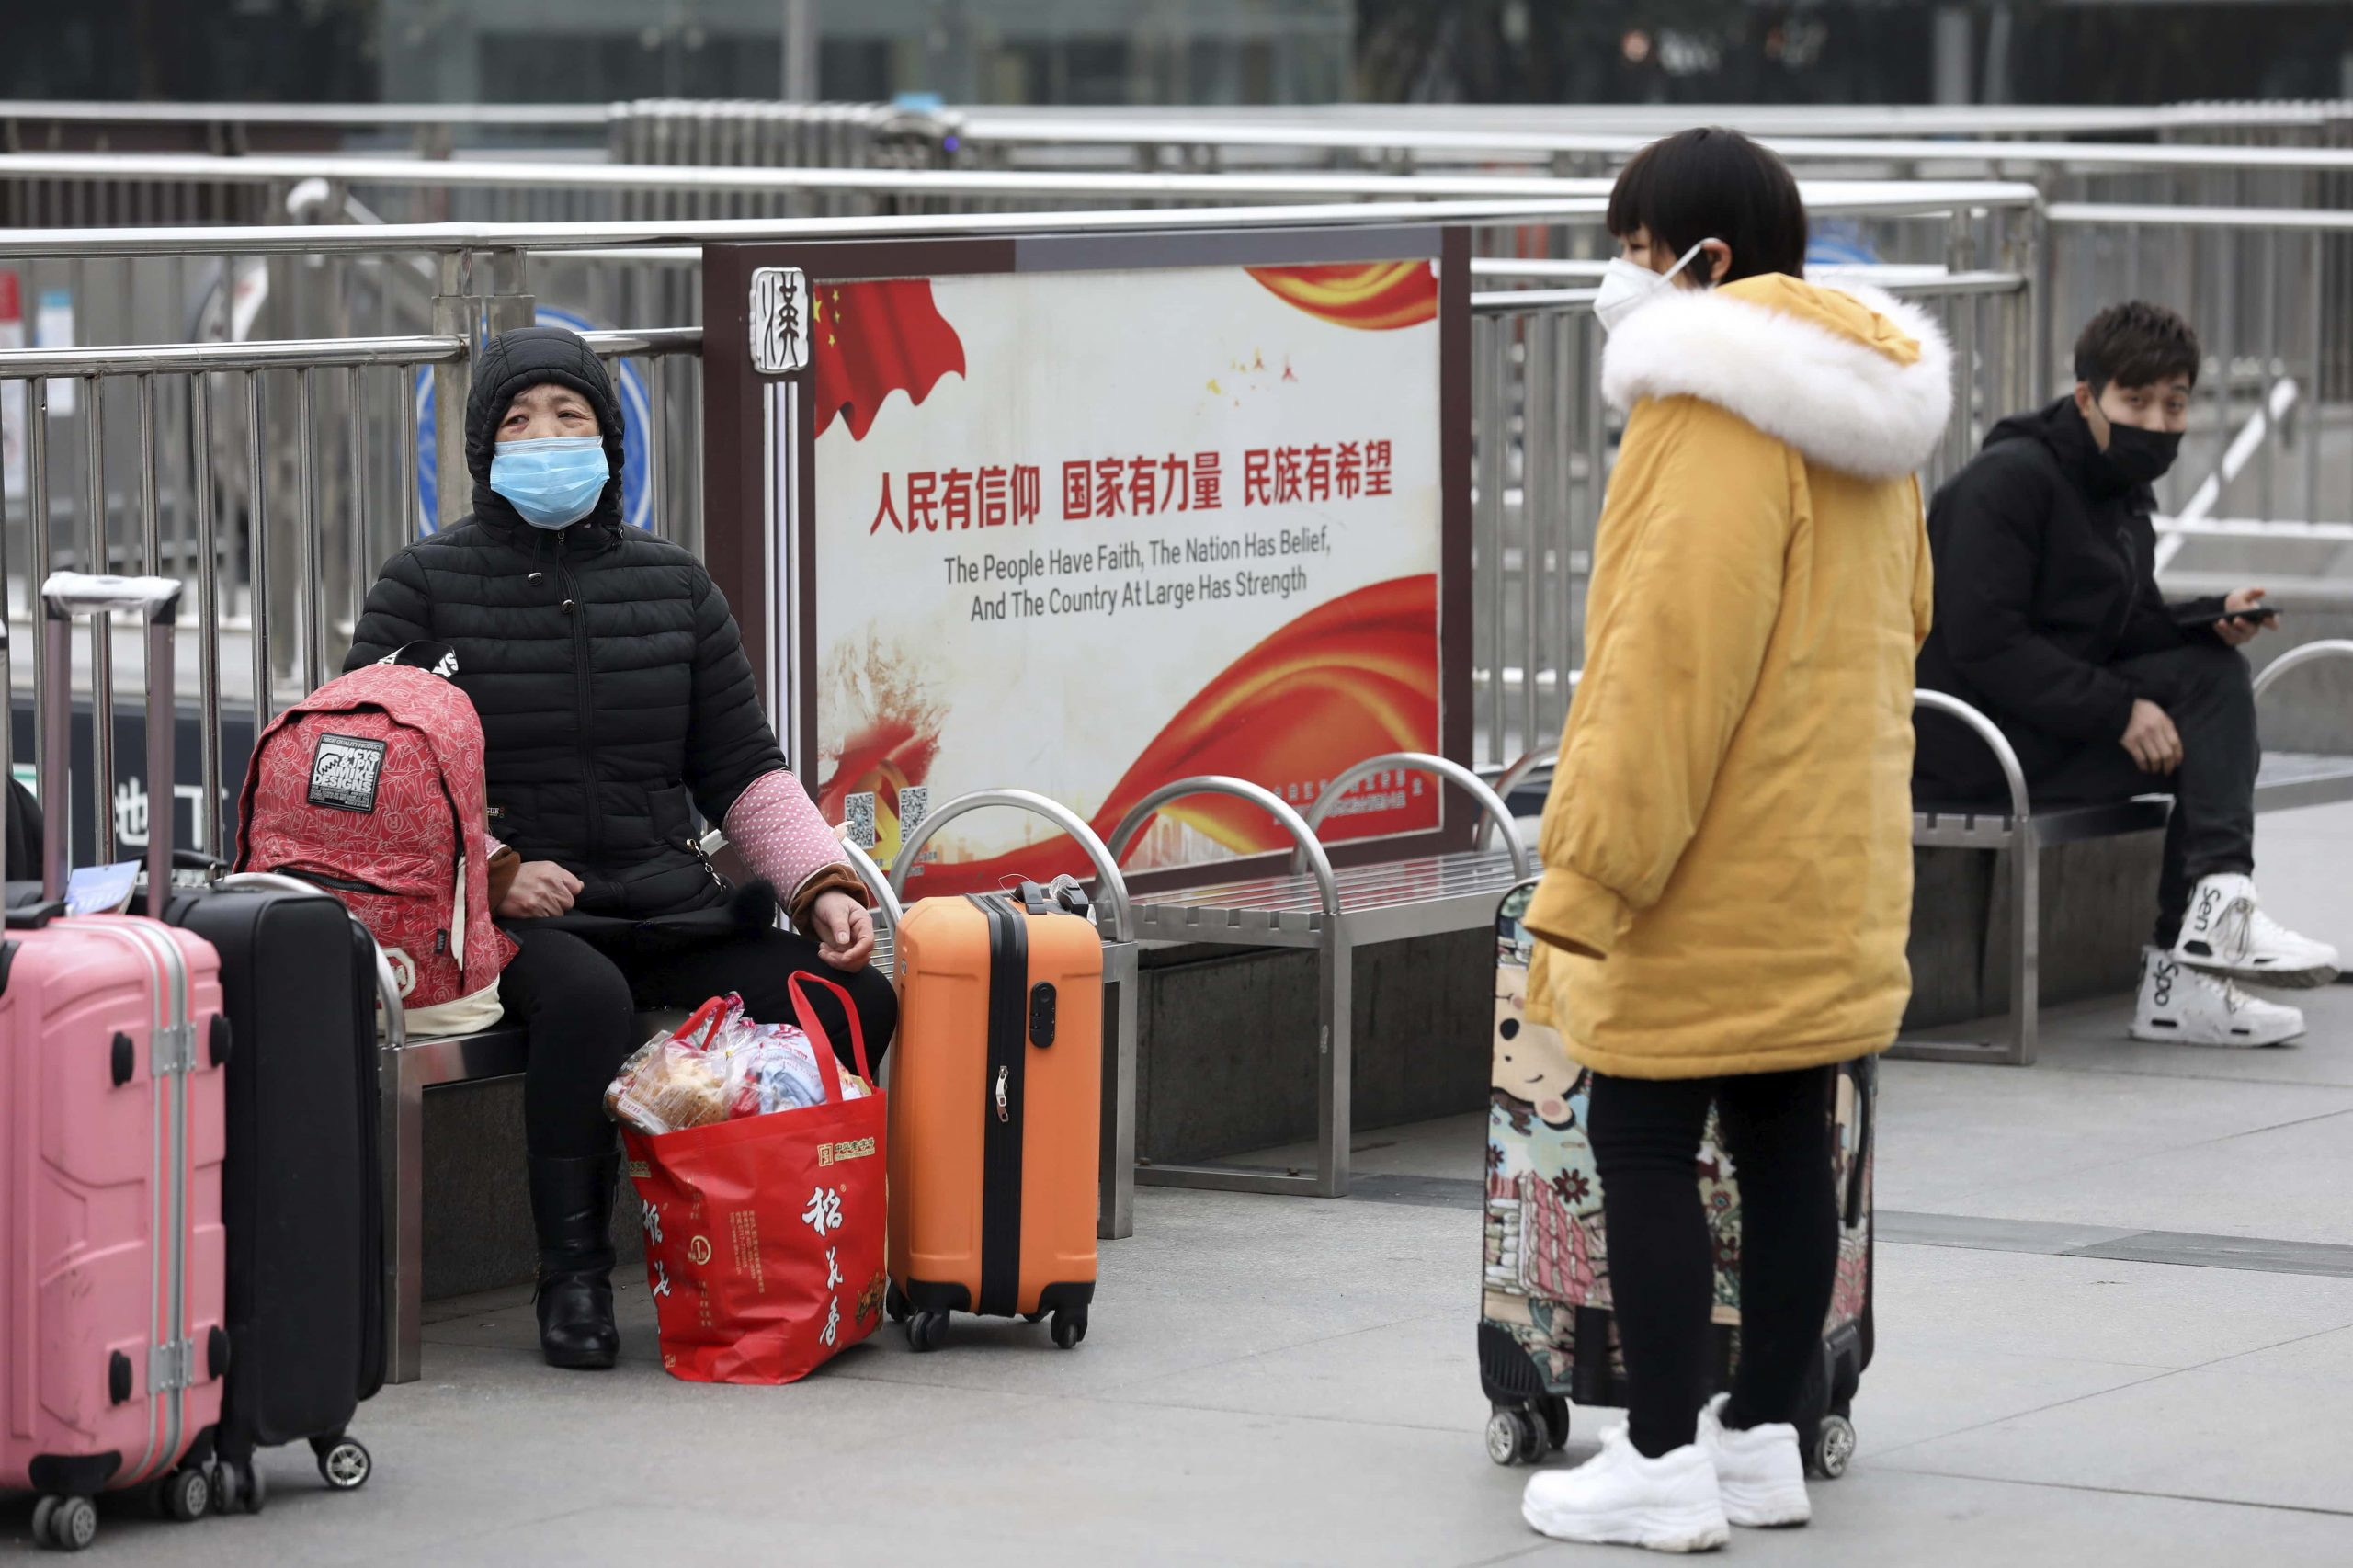 Wuhan Coronavirus: China Was Warned in 2017 1